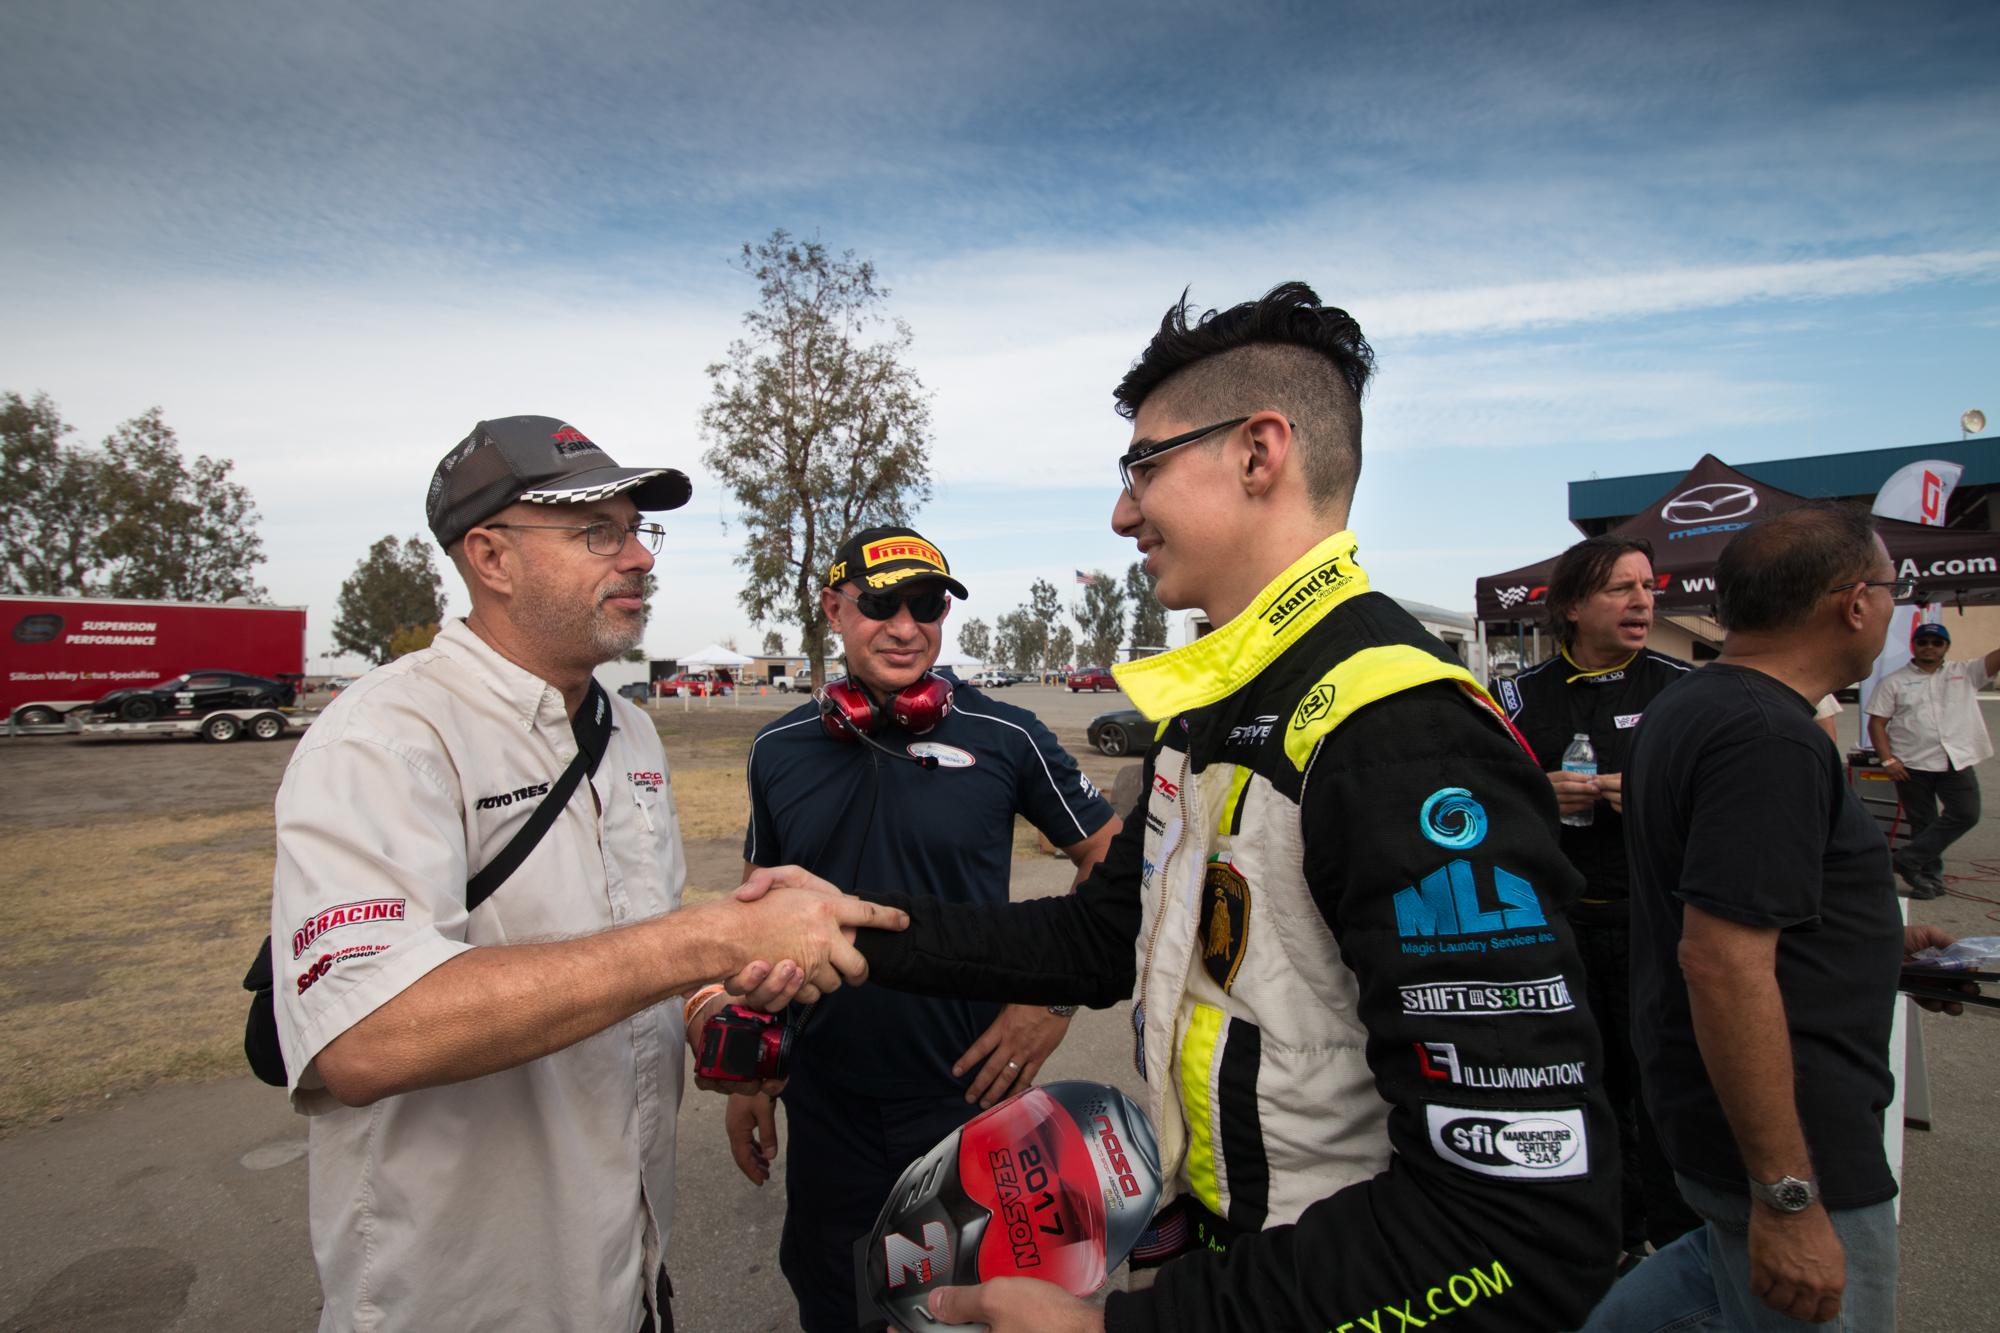 Steven-Racing-20130301-55749.jpg